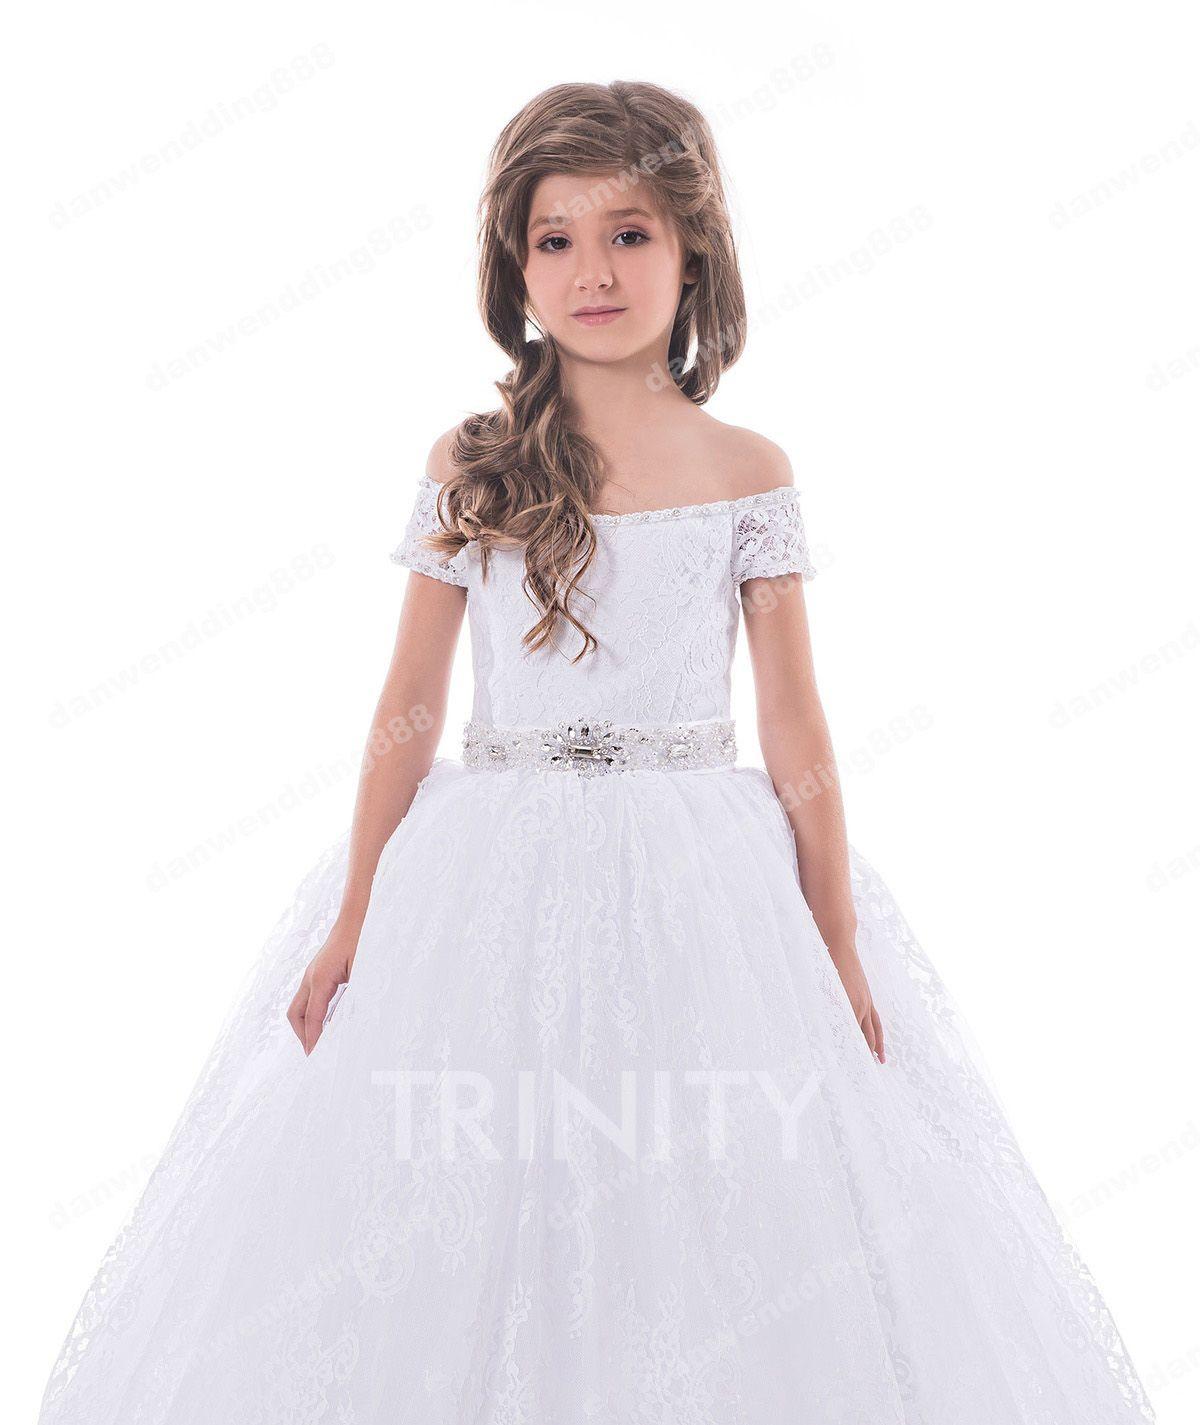 Beauty White Lace Off Shoulder Sash Flower Girl Dresses Princess Dresses Girl's Pageant Dresses Custom Made Size 2-6 8 10 12 14 KF327250